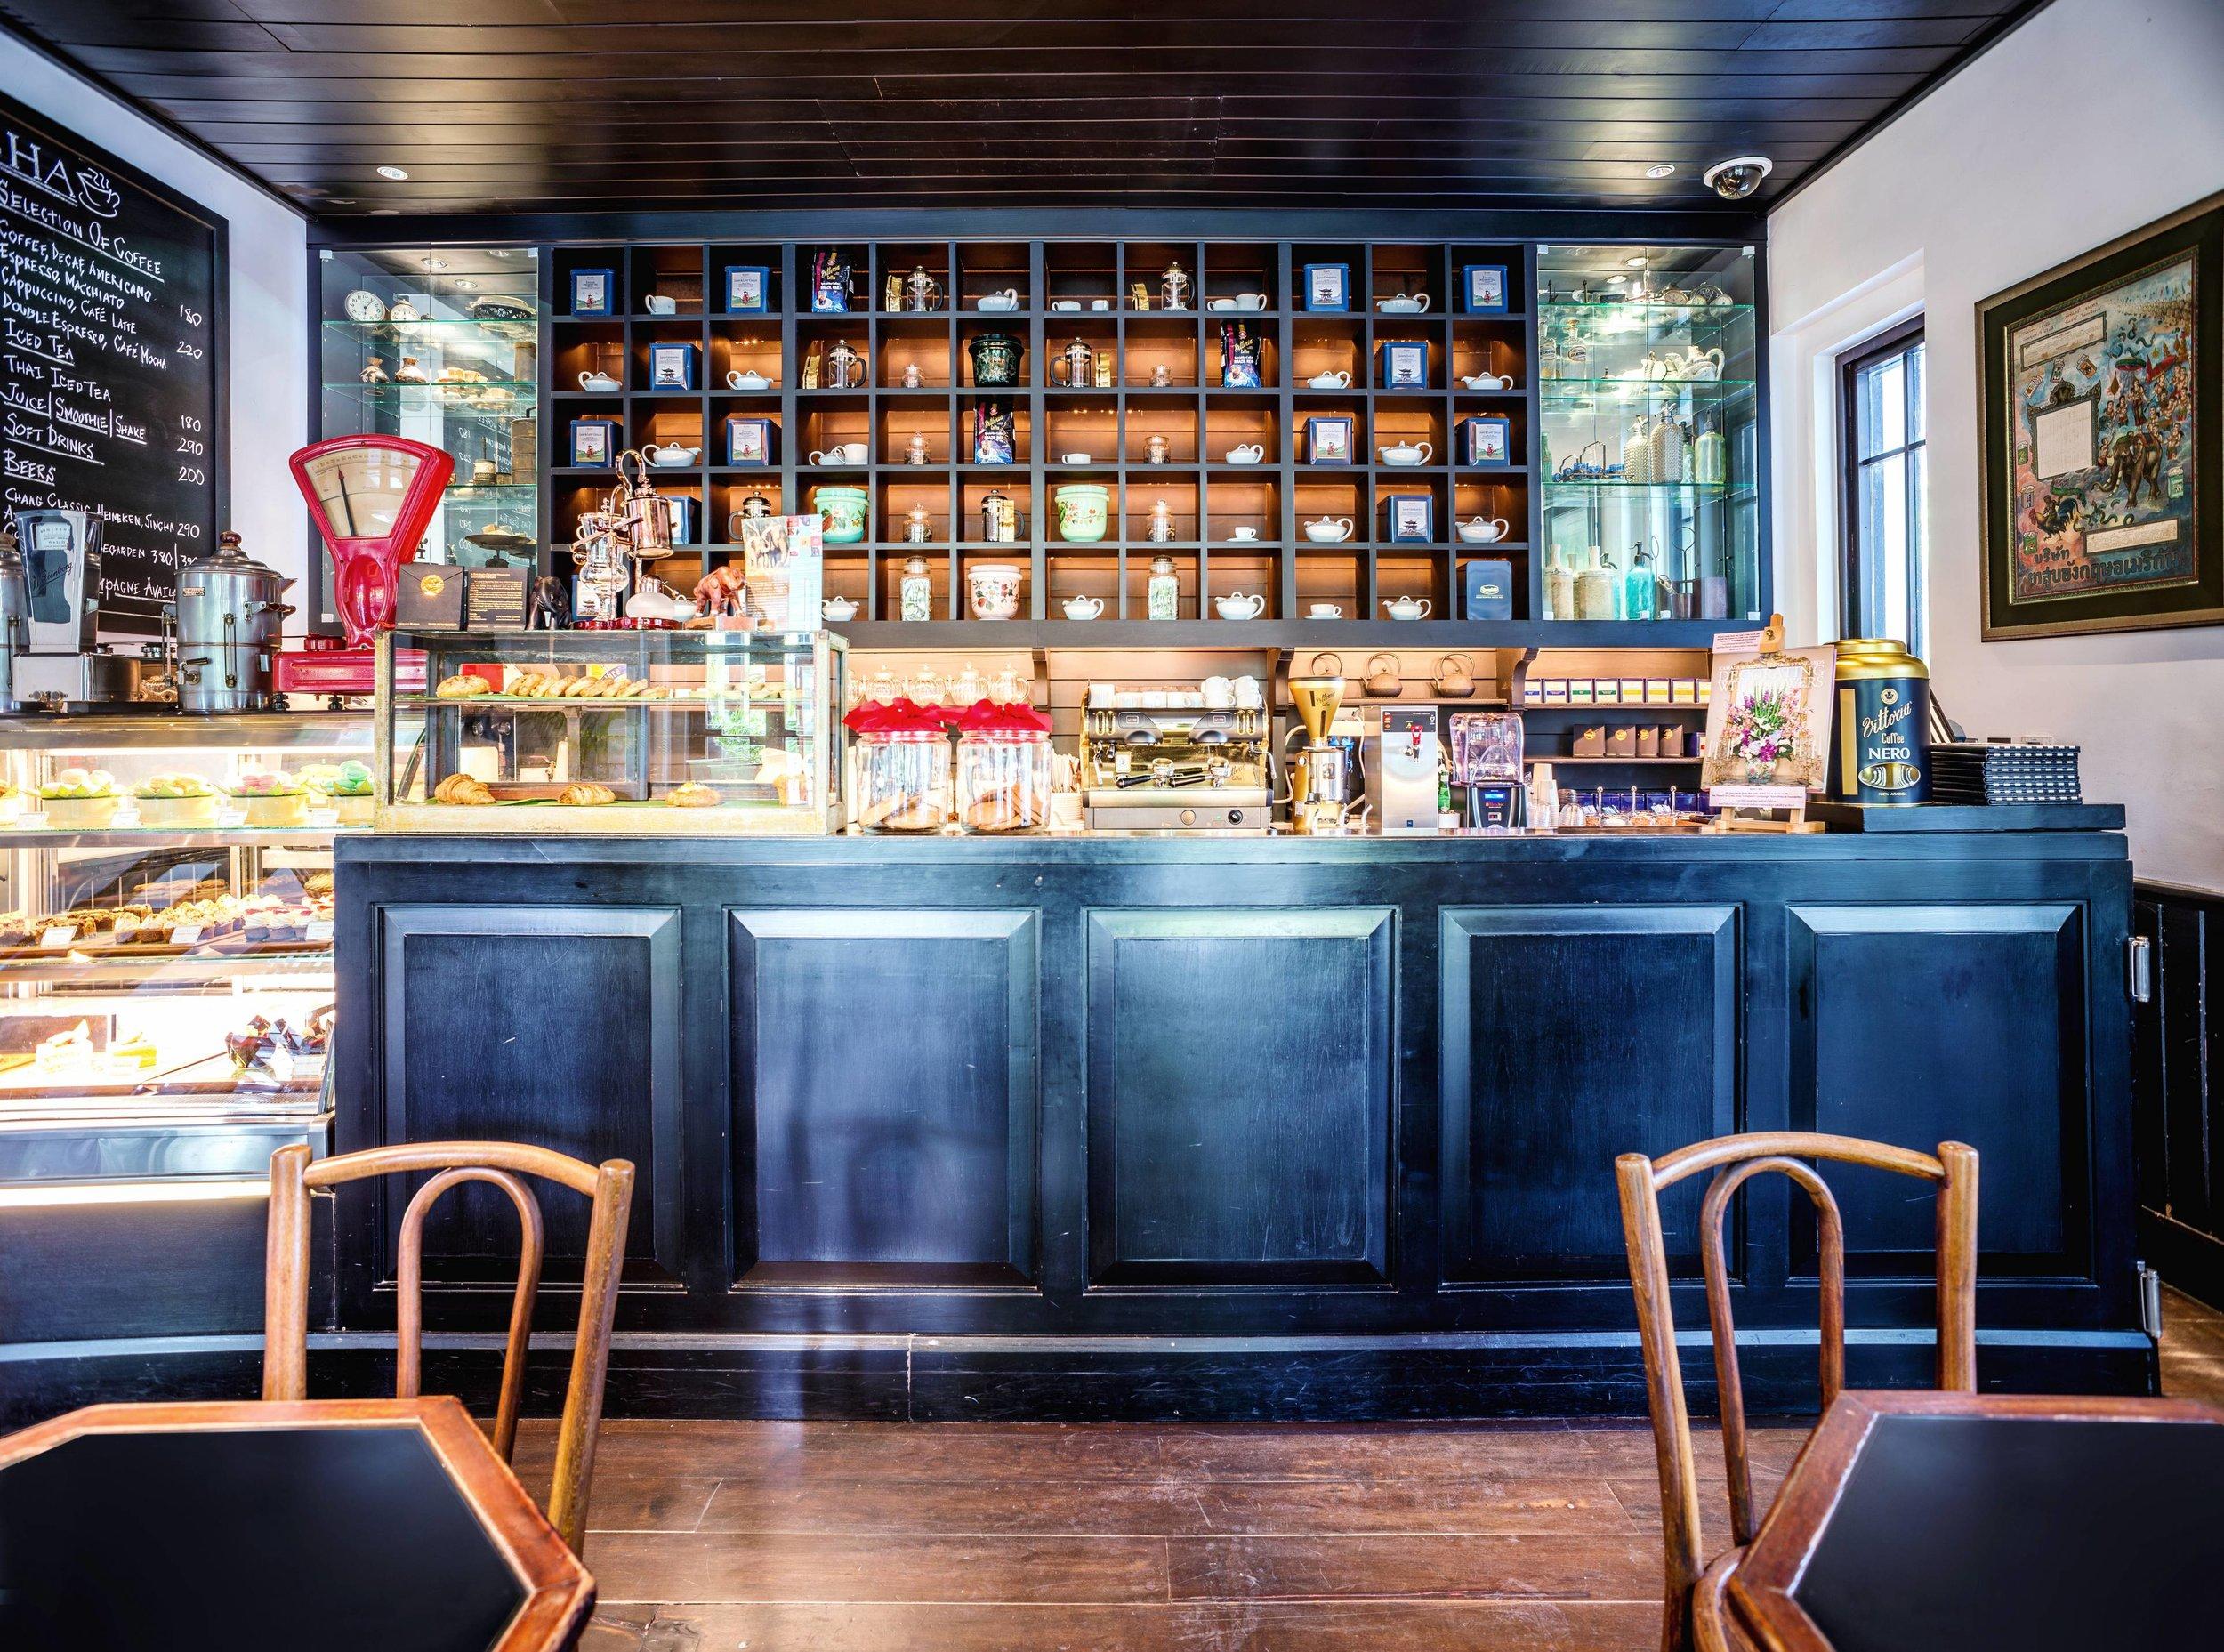 Café Cha - Photo Courtesy of The Siam Hotel